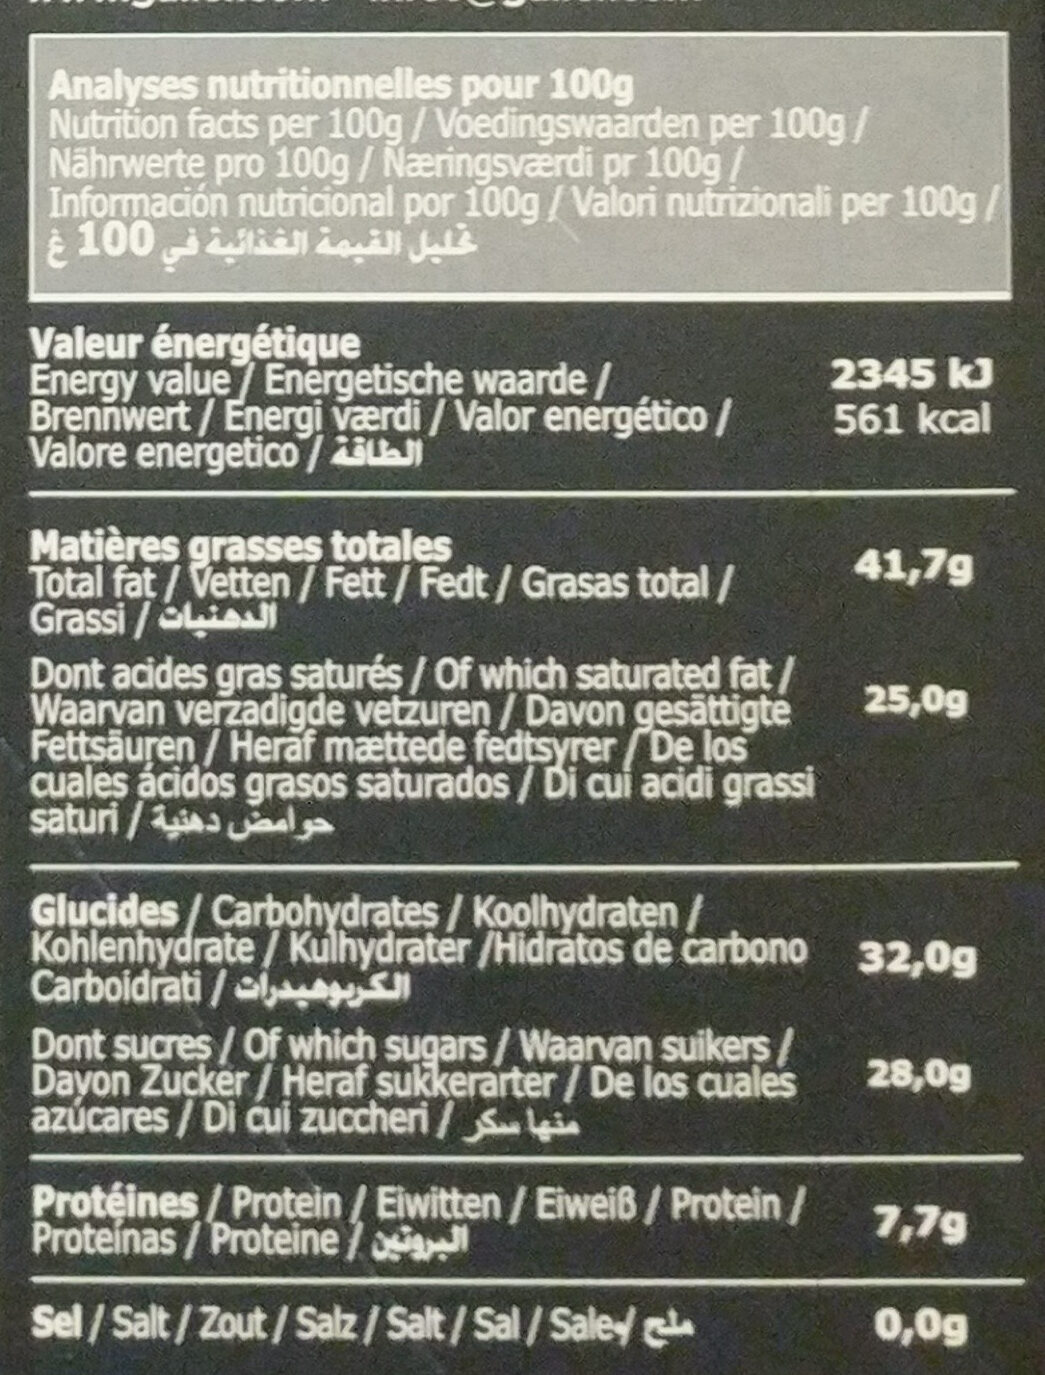 Tablette Galler Noire Intense 70% - Informations nutritionnelles - fr